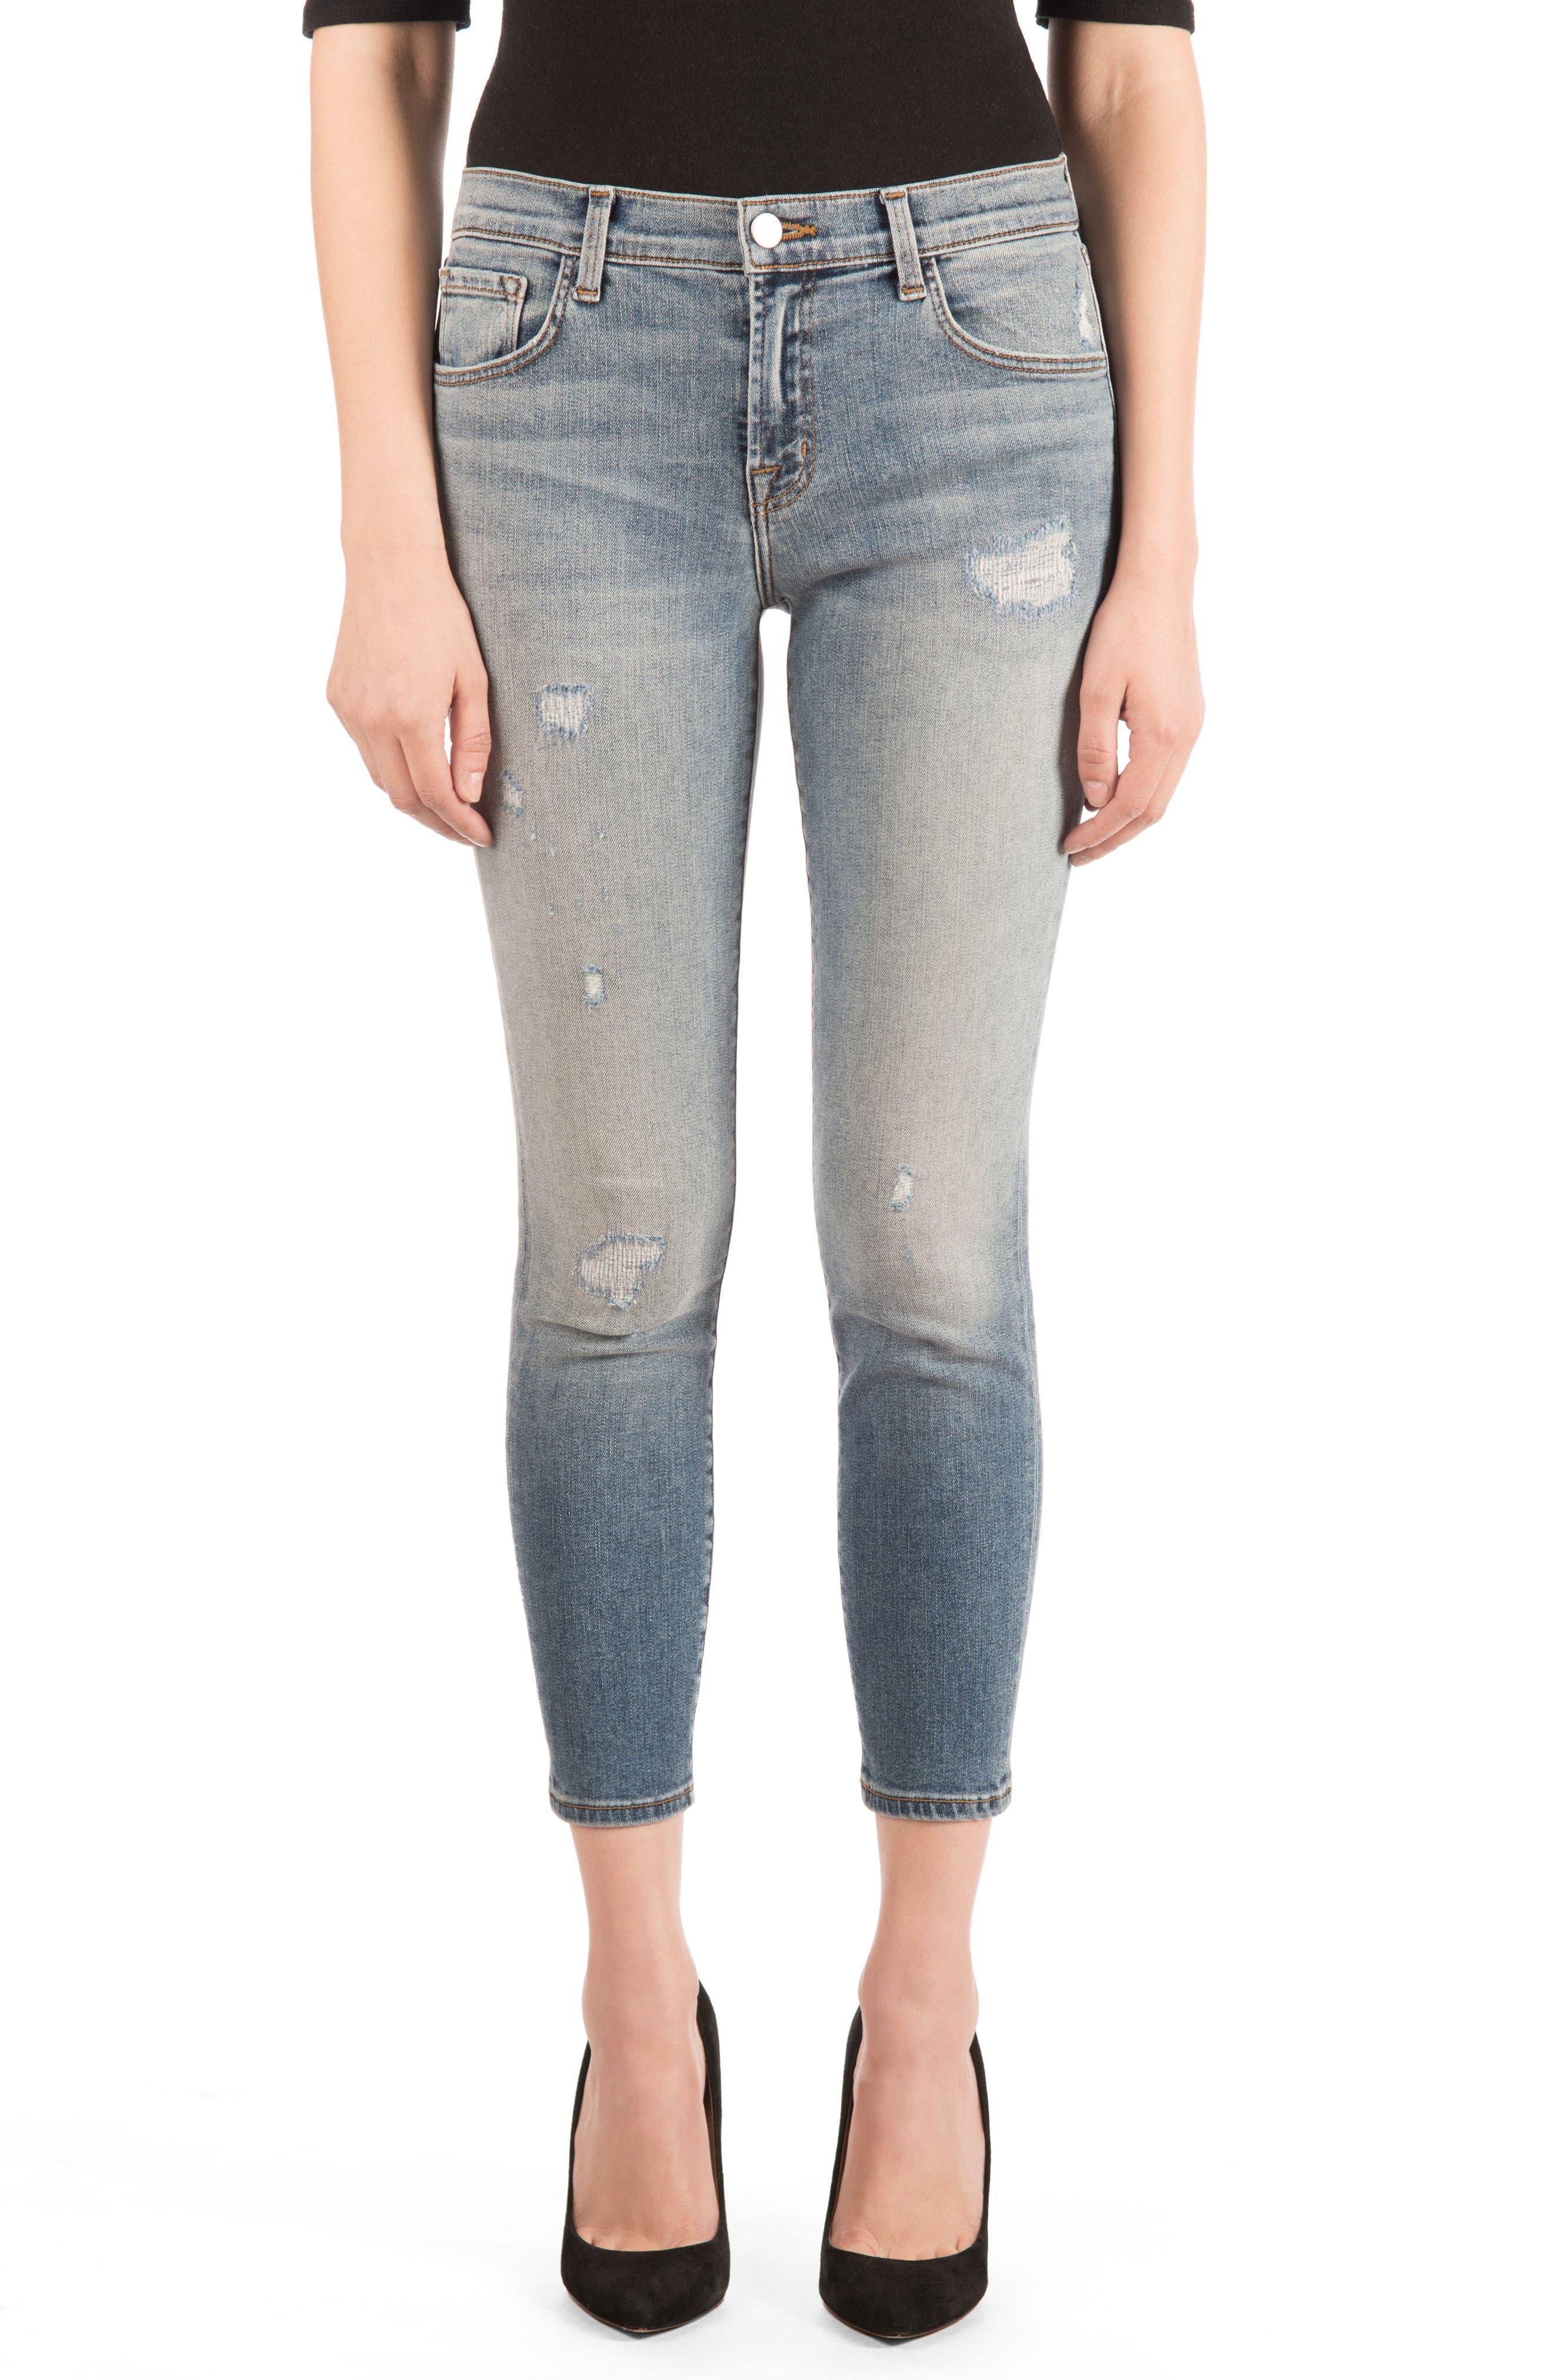 835 Distressed Capri Skinny Jeans,                         Main,                         color, 430